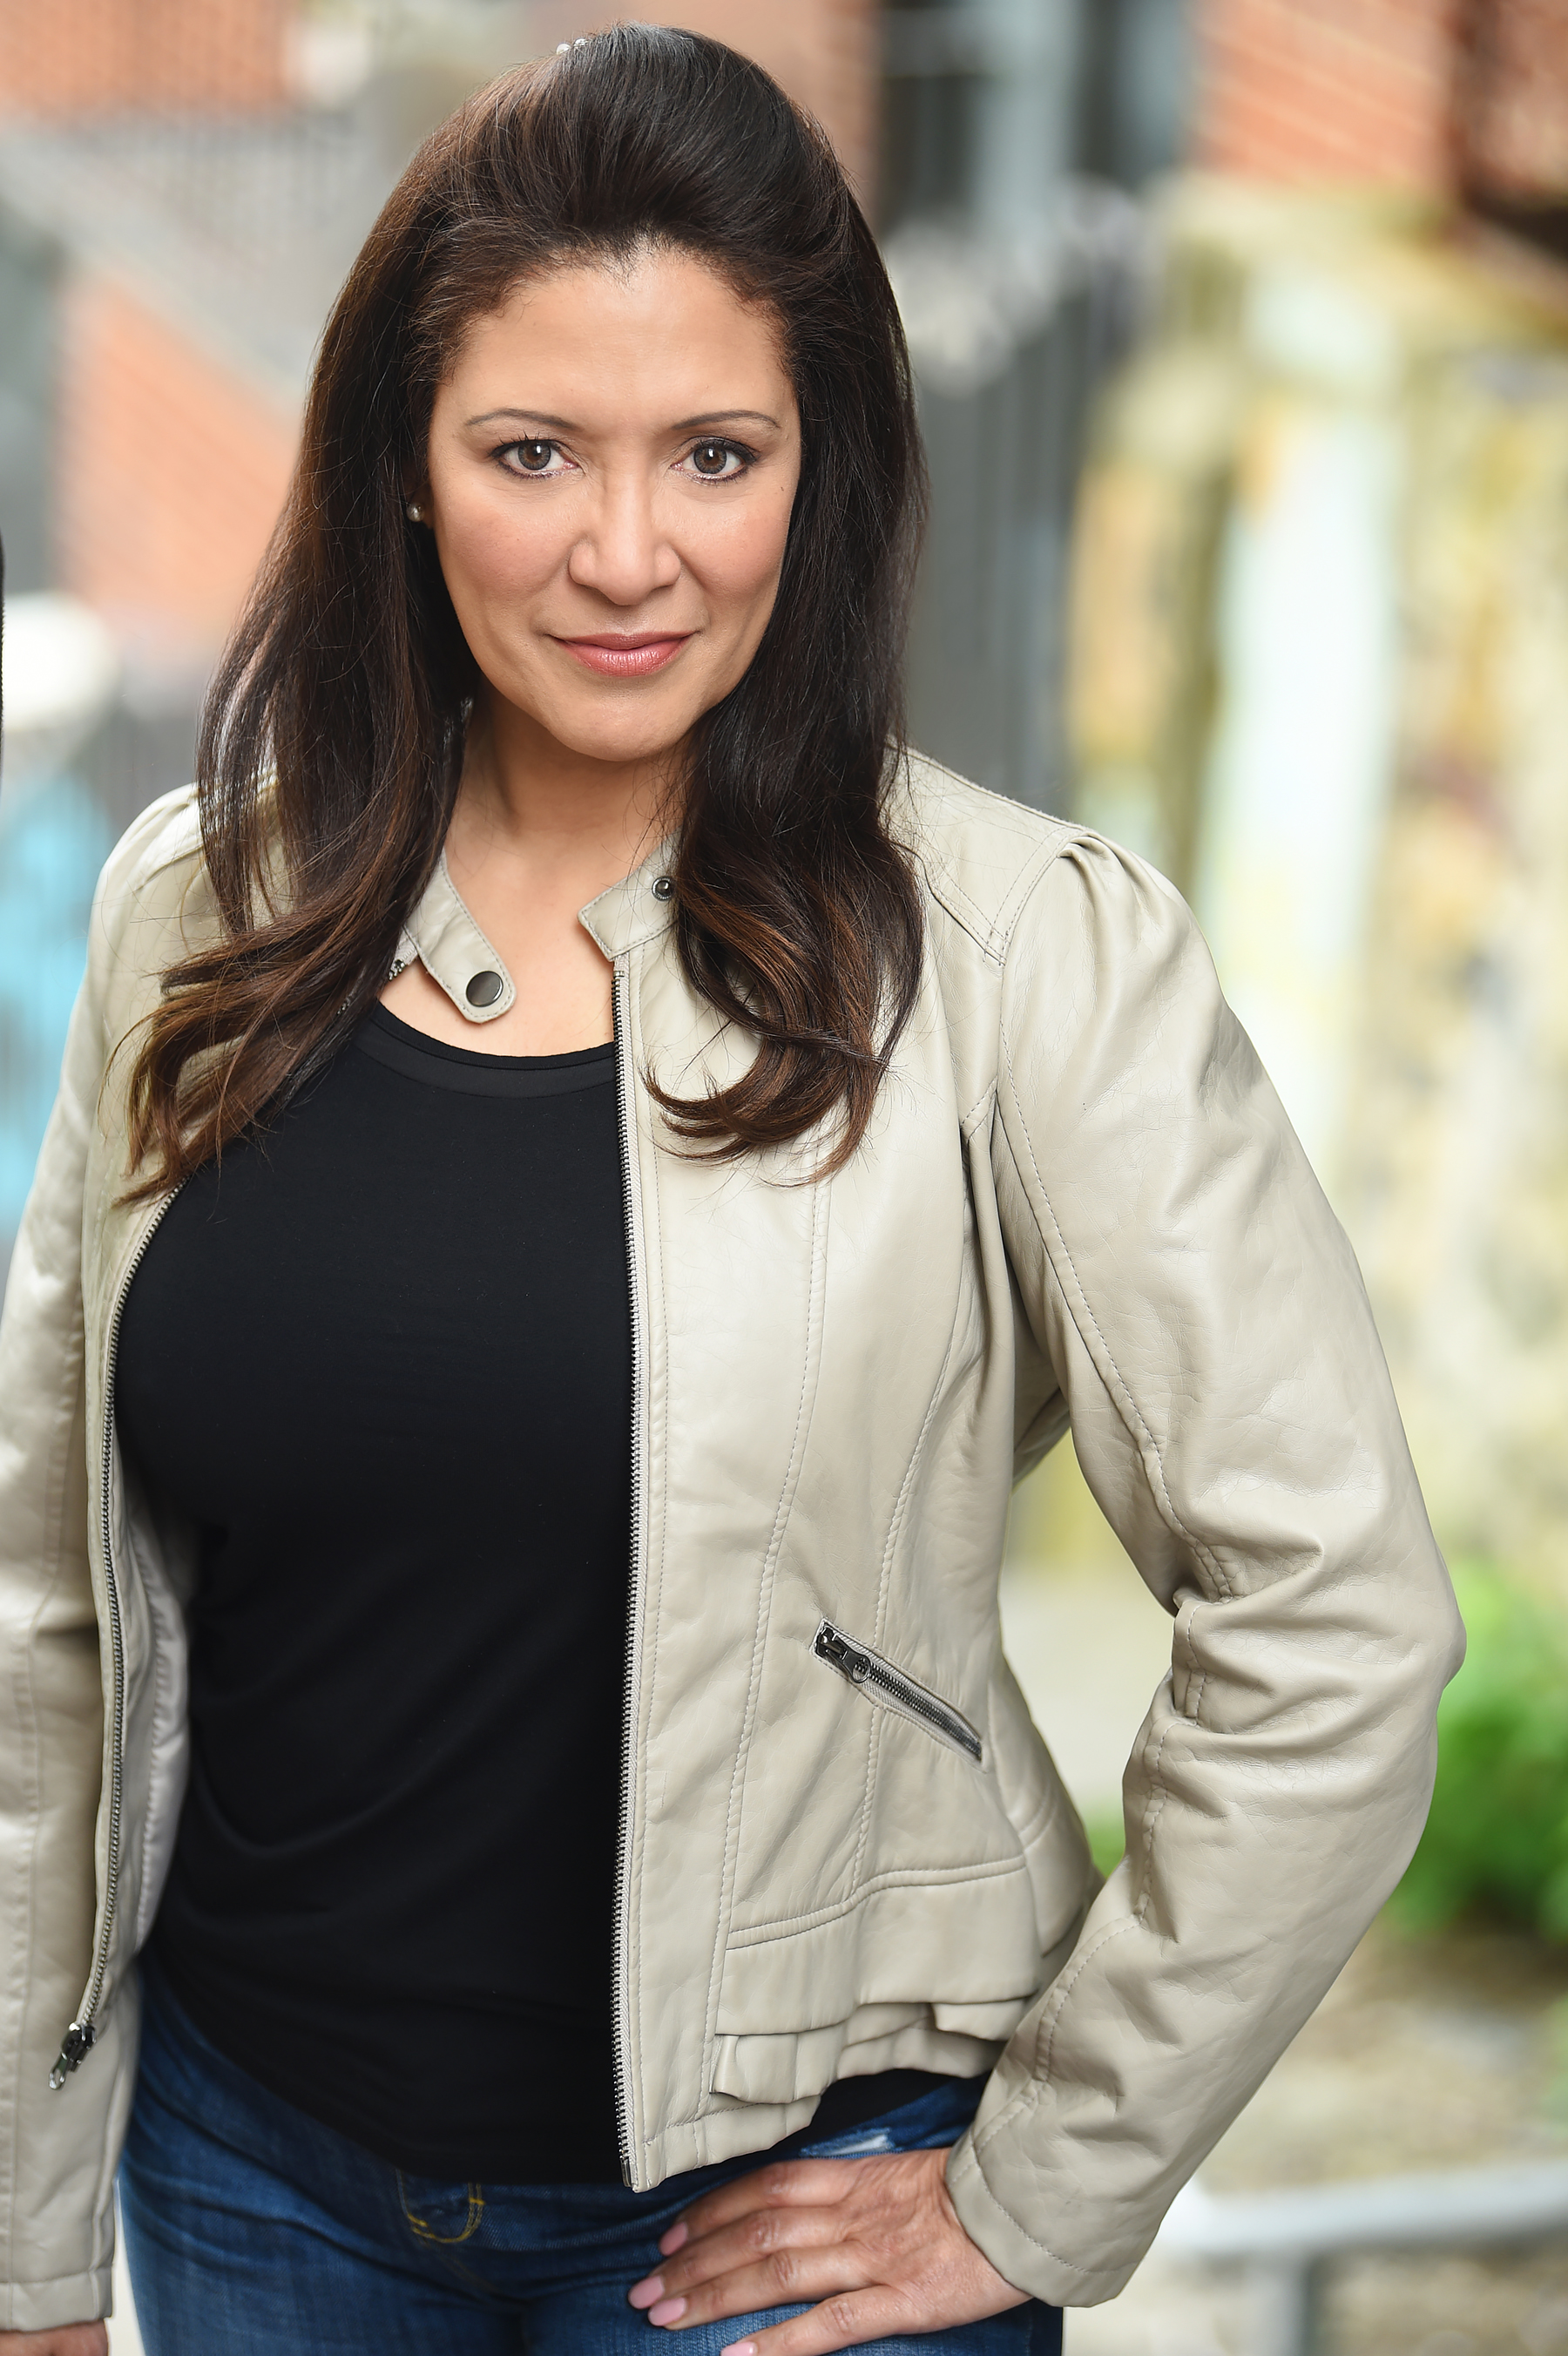 Iliana Guibert